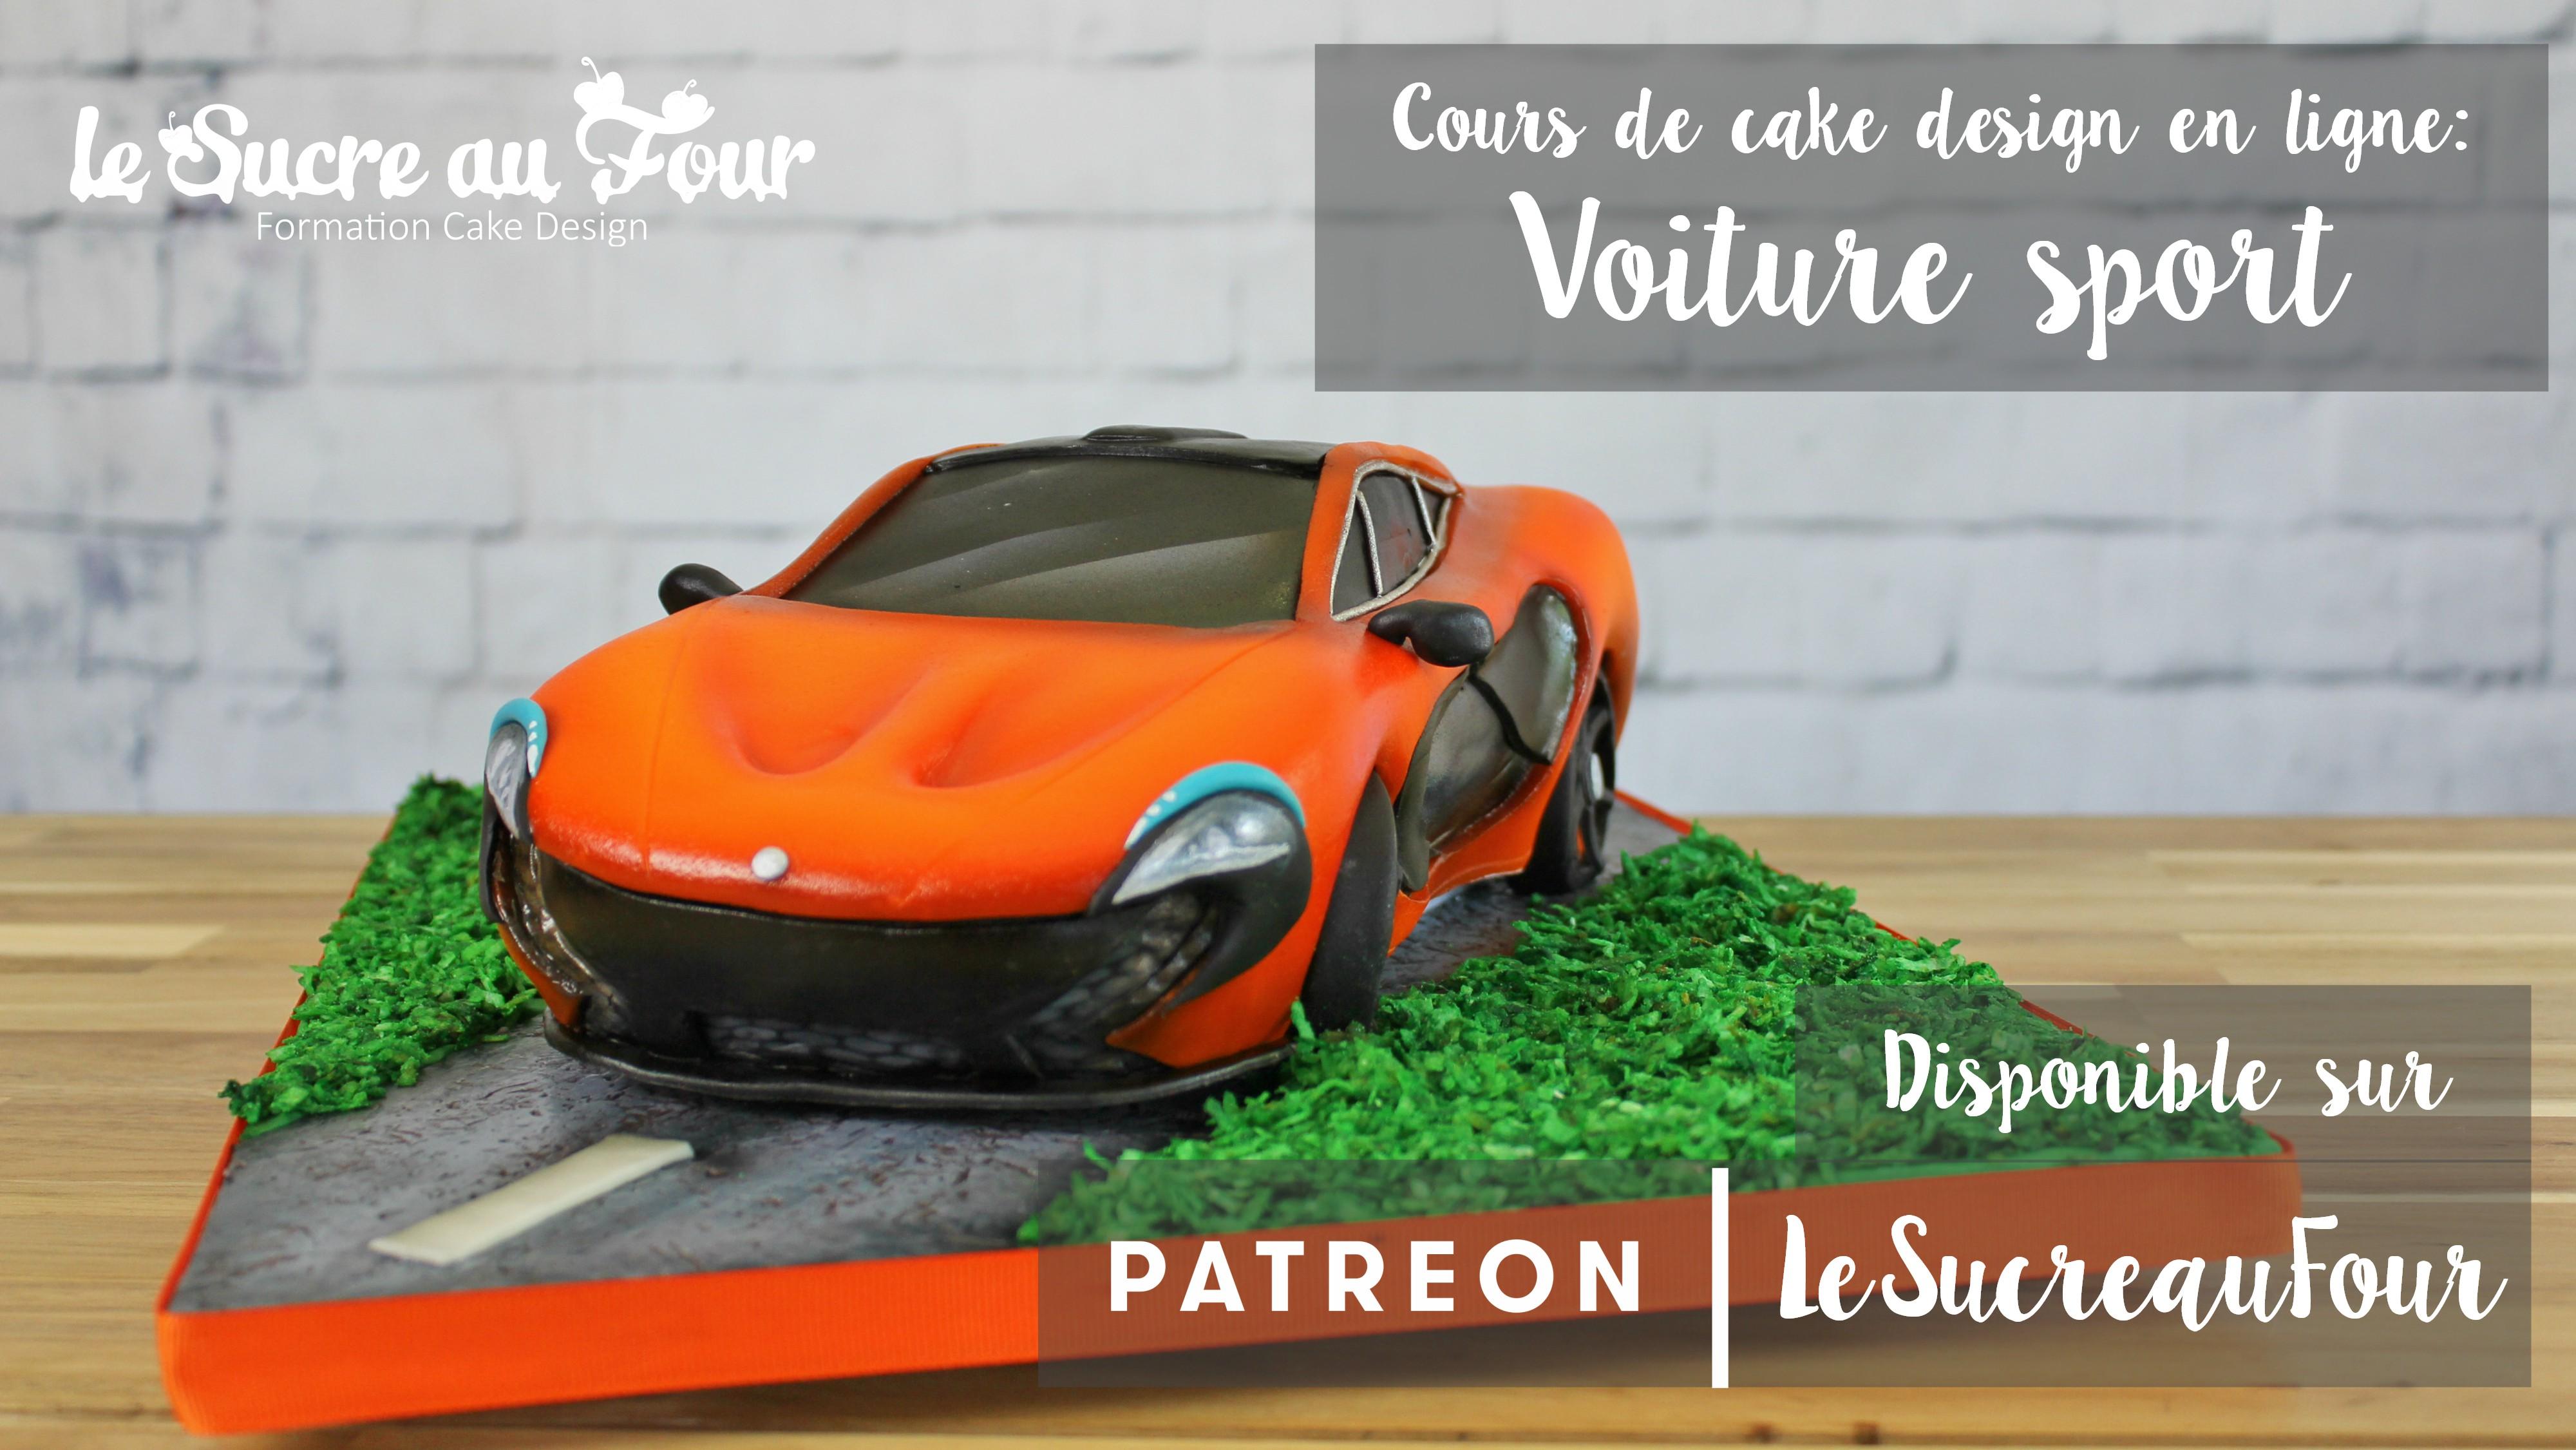 cours de cake design en ligne voiture de sport le sucre. Black Bedroom Furniture Sets. Home Design Ideas